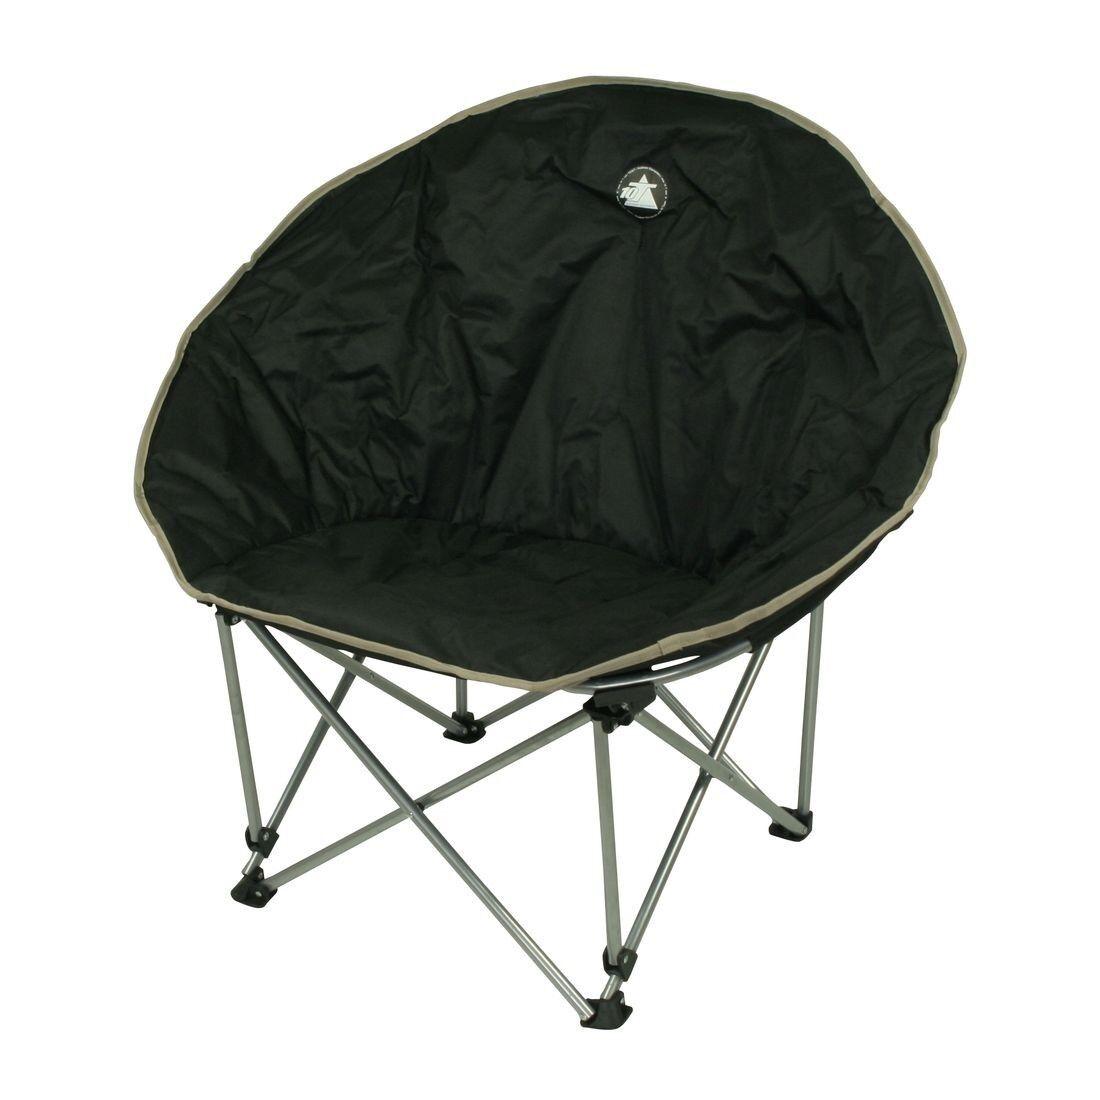 10T Moonchair XXL Campingstuhl Relax-Sessel Gartenstuhl… | 04260181763651